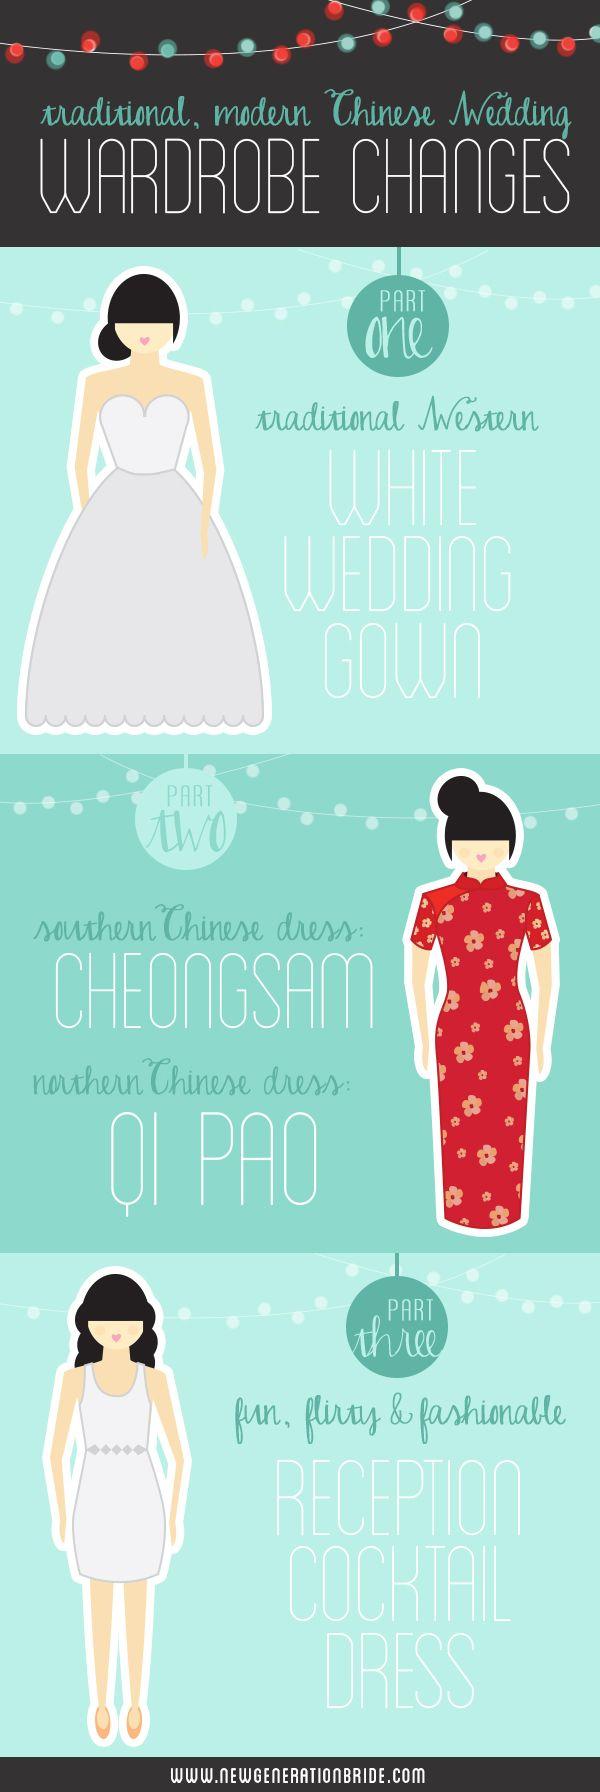 """Traditional, Modern Chinese Wedding Wardrobe Changes"" Infographic for New Generation Bride, designed by Shivani Kapoor #infographic #chinesewedding #newgenerationbride"